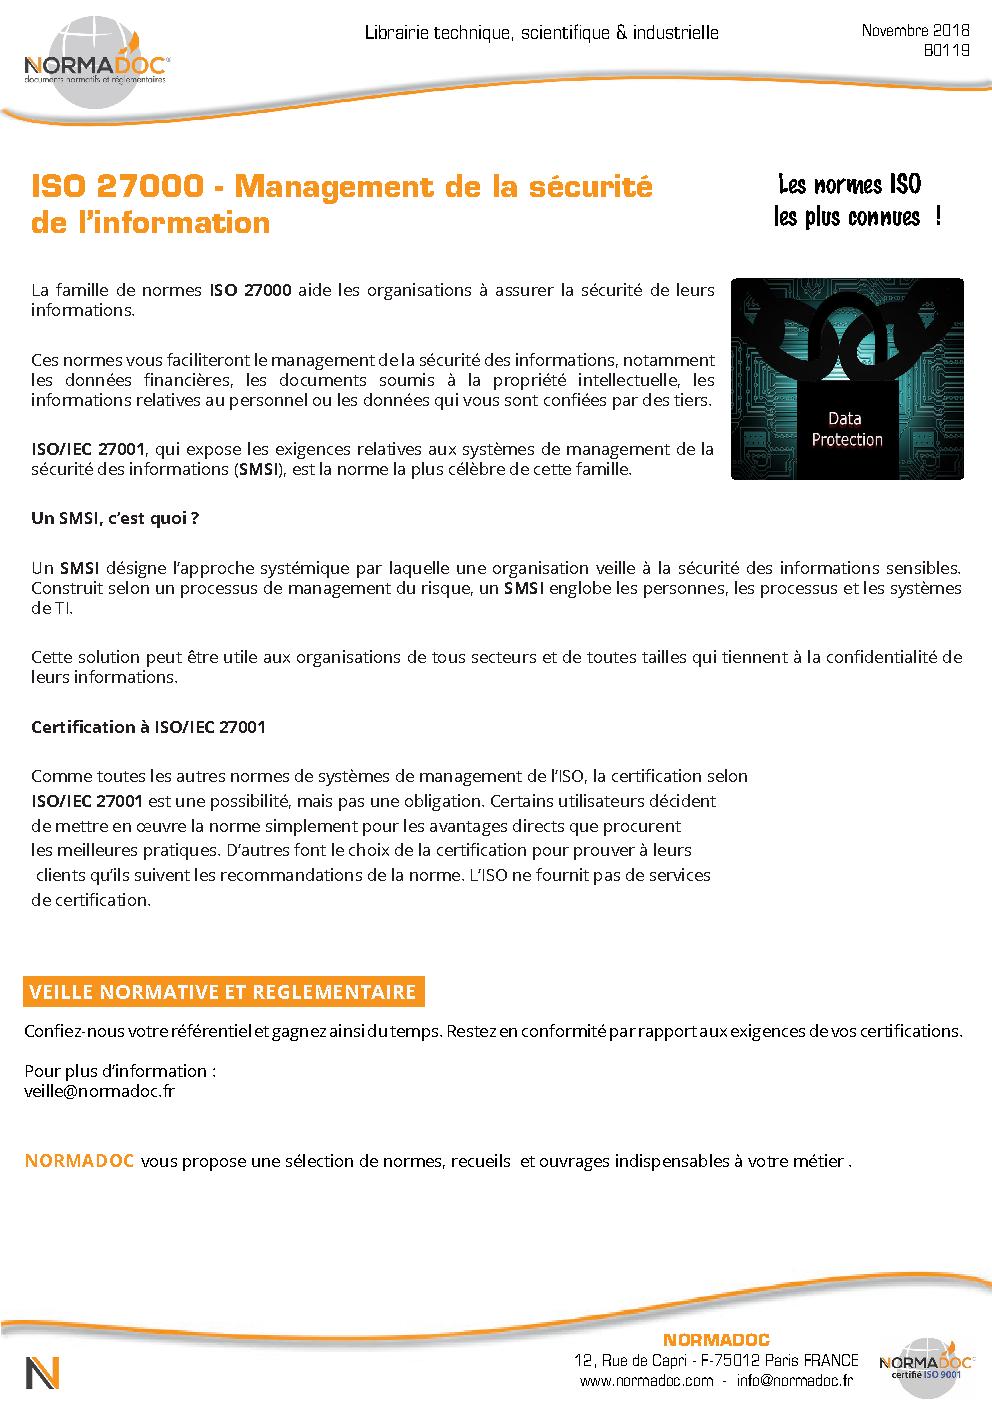 norme iso 27001 pdf francais